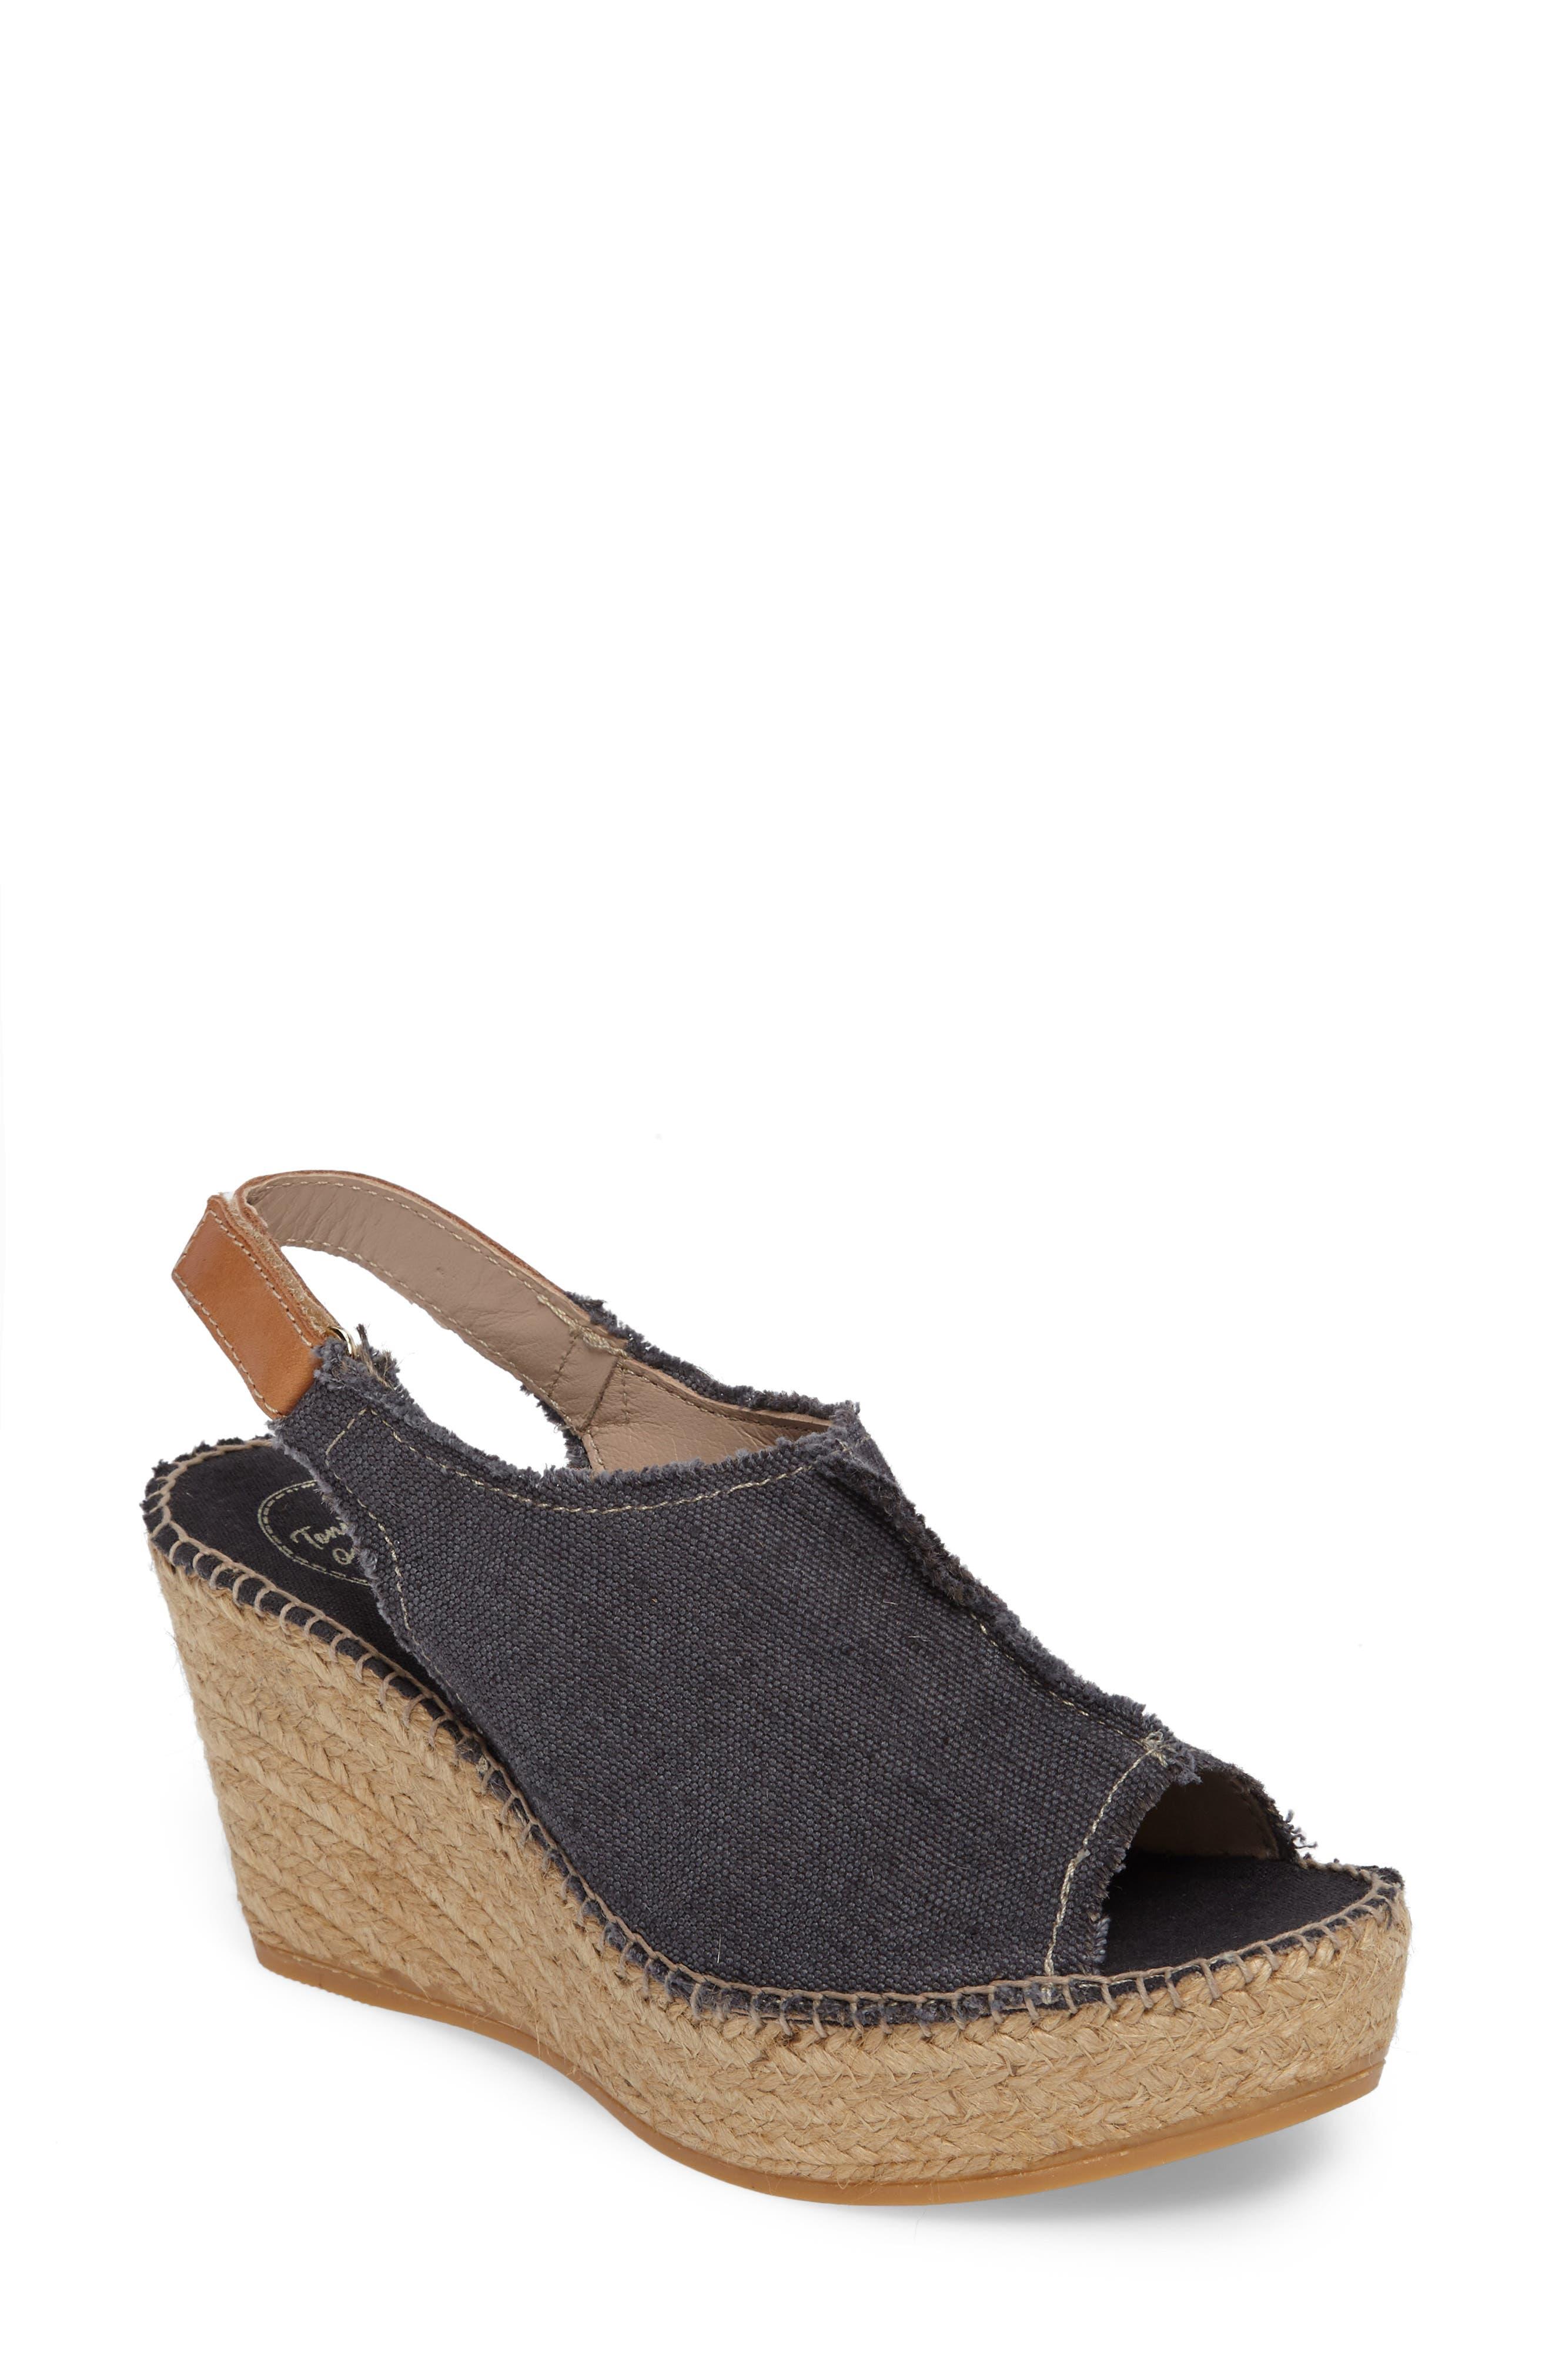 TONI PONS 'Lugano' Espadrille Wedge Sandal, Main, color, BLACK FABRIC